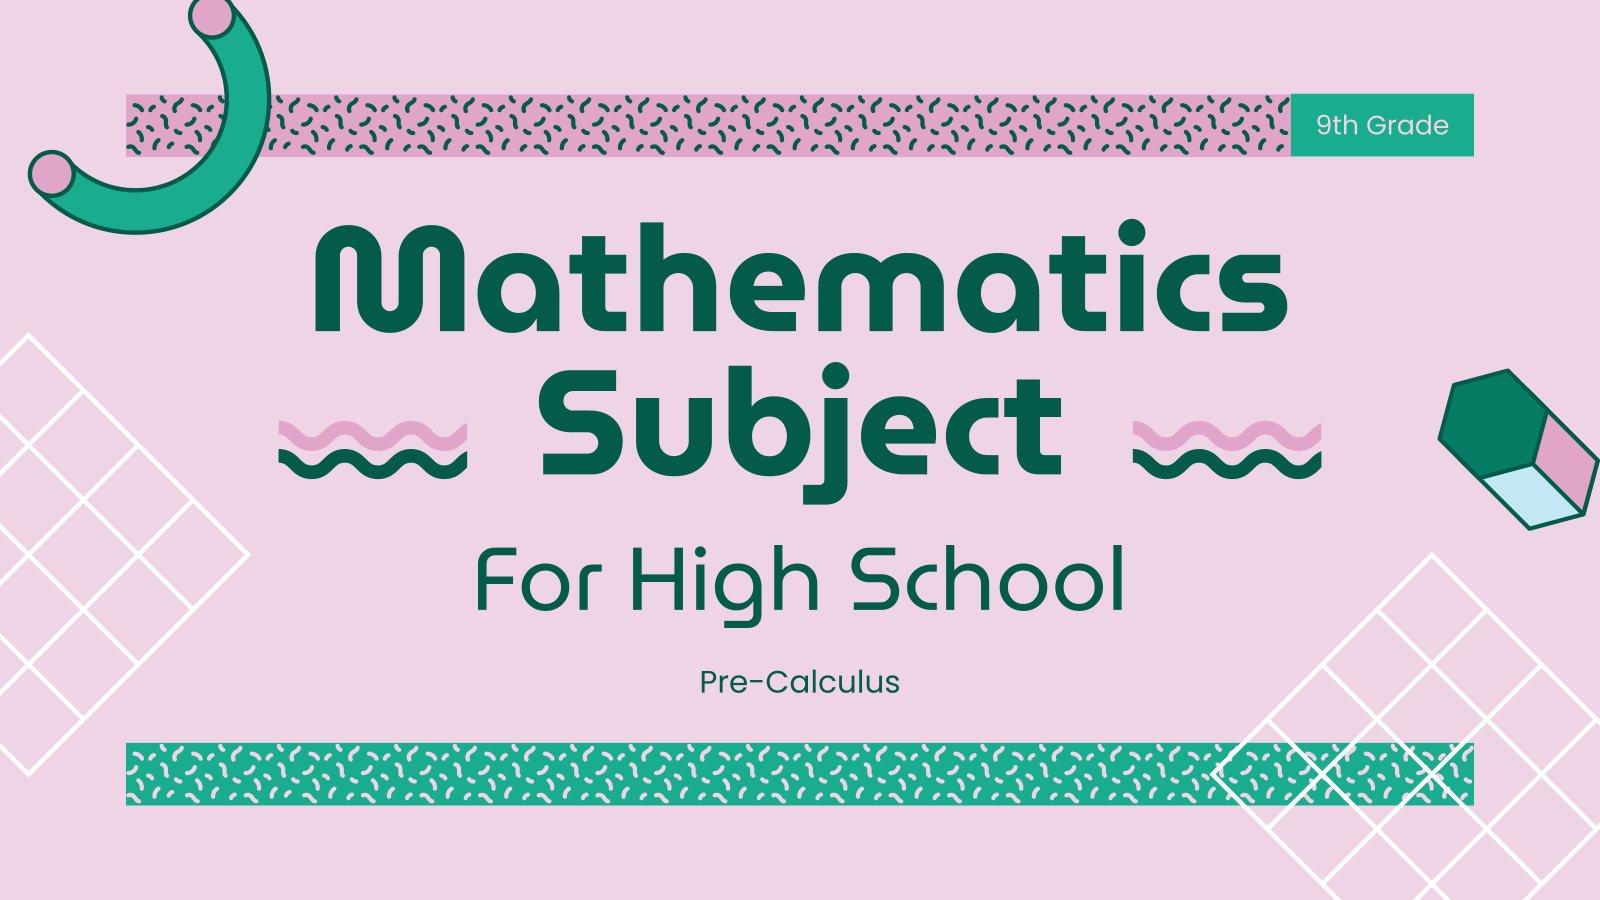 Mathematics Subject for High School - 9th Grade: Pre-Calculus presentation template